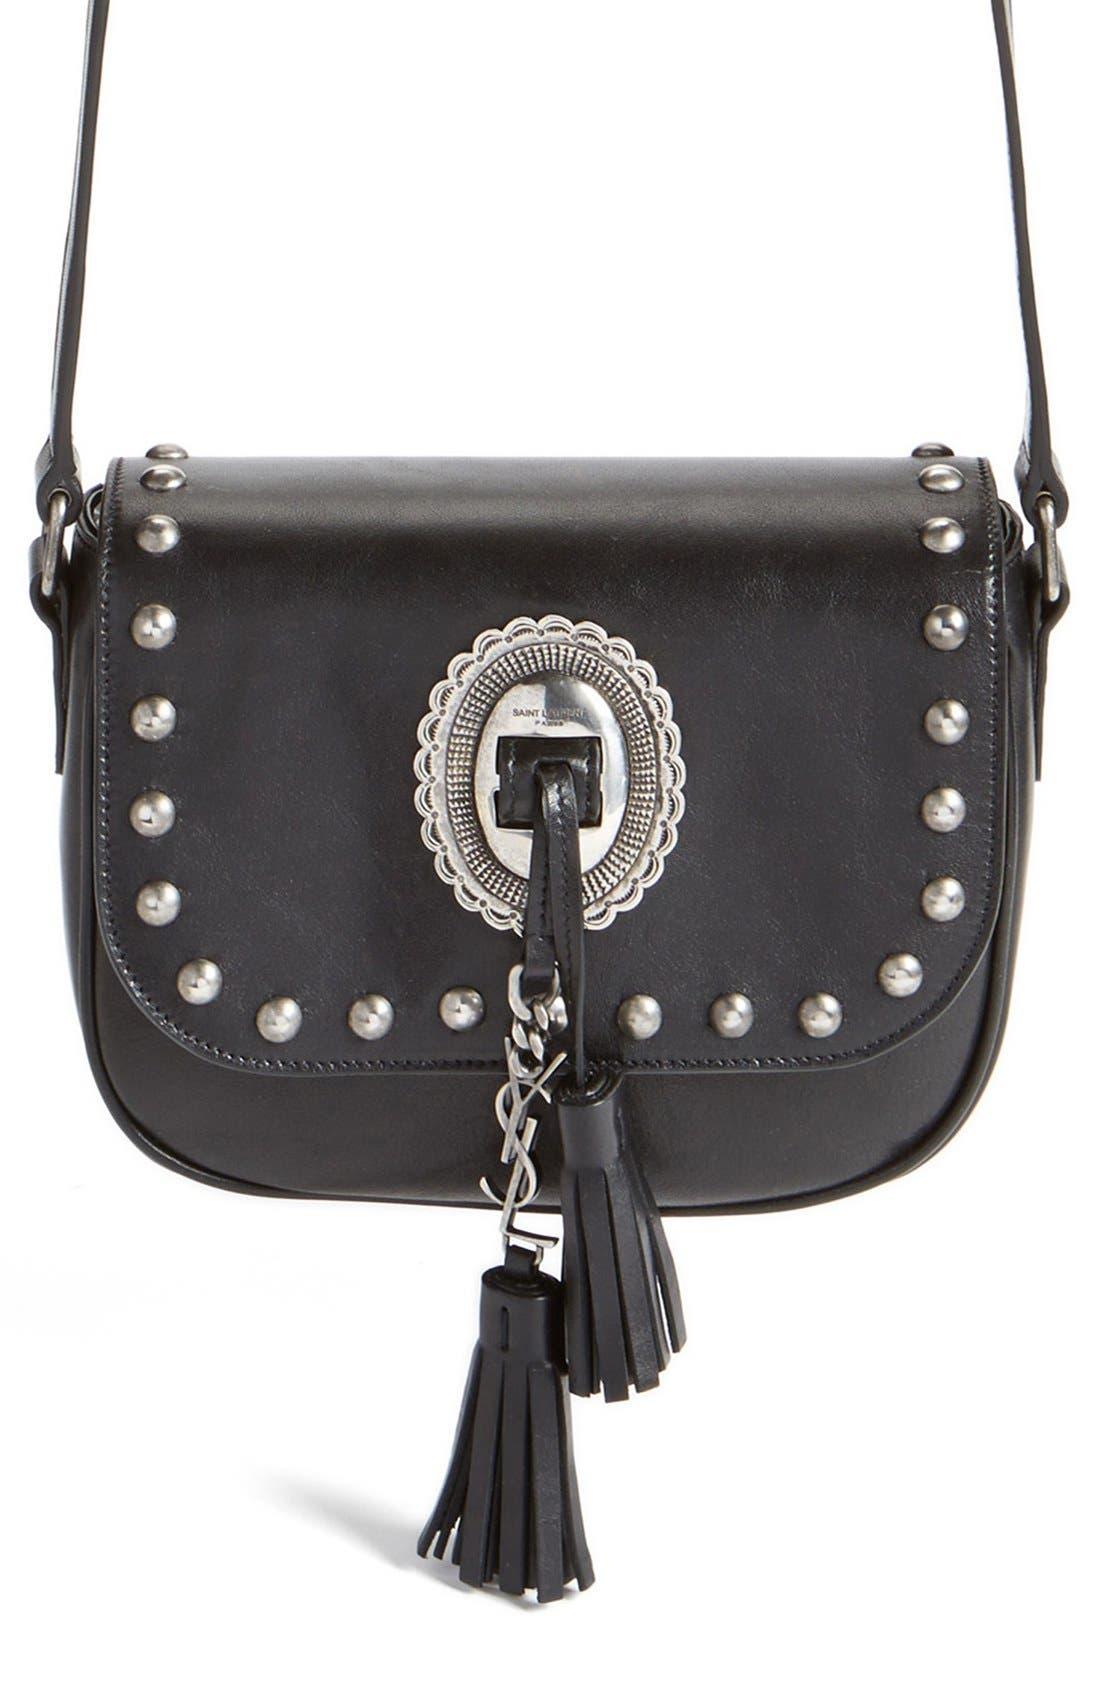 Alternate Image 1 Selected - Saint Laurent 'Small Kim' Calfskin Crossbody Bag